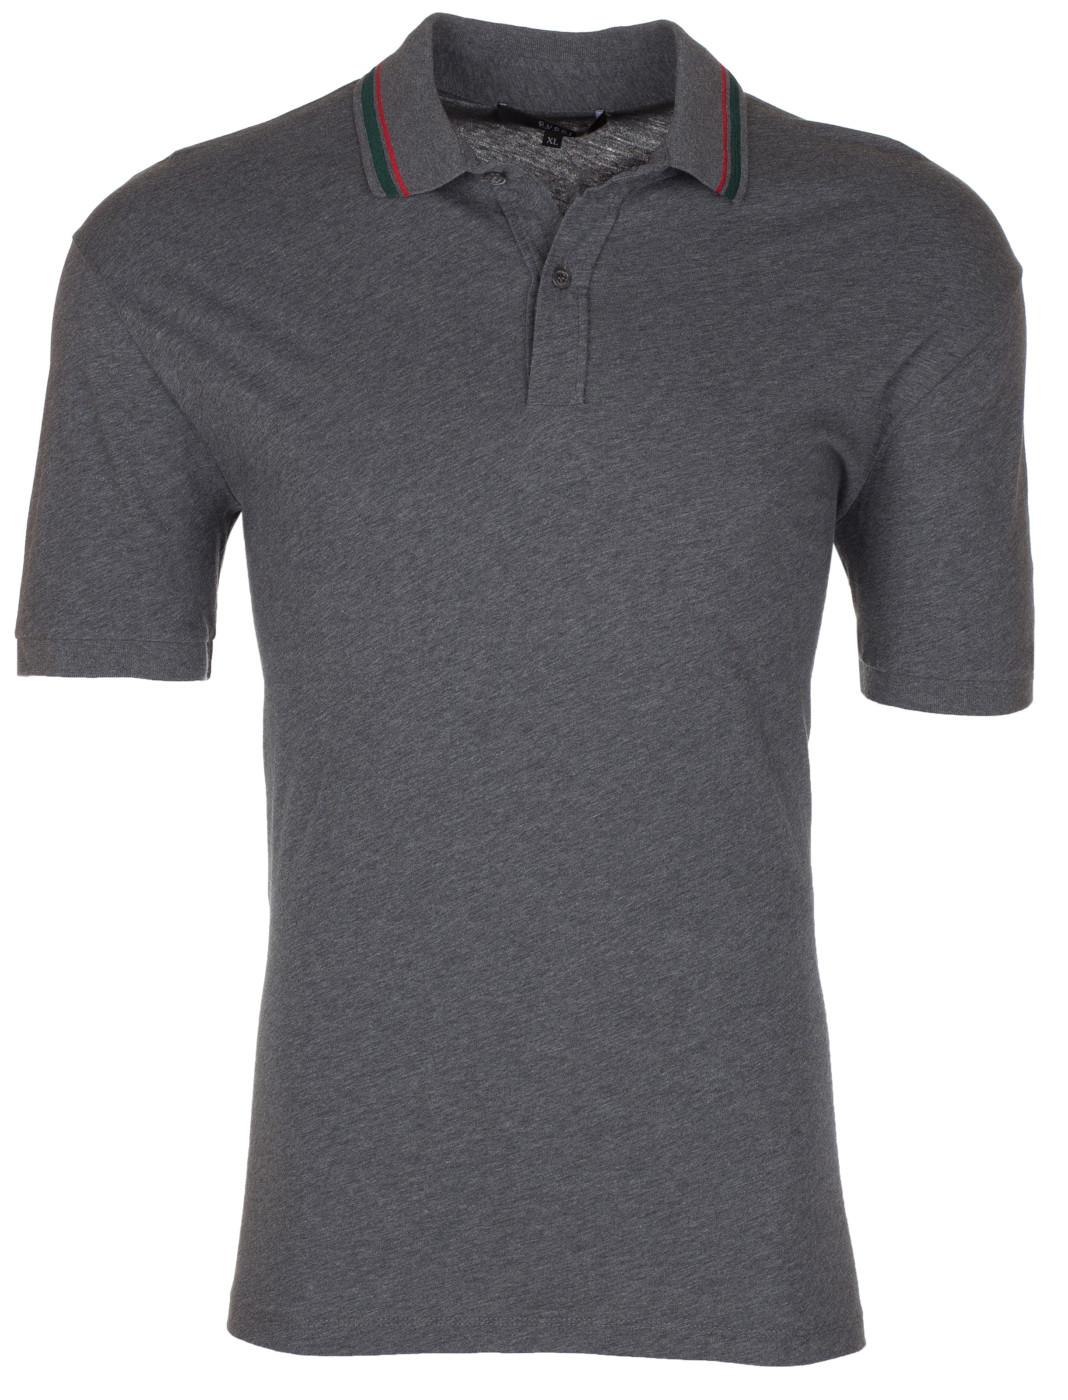 d845ec324 Gucci Men's Grey Cotton Classic Web Stripe Button Down Polo Shirt